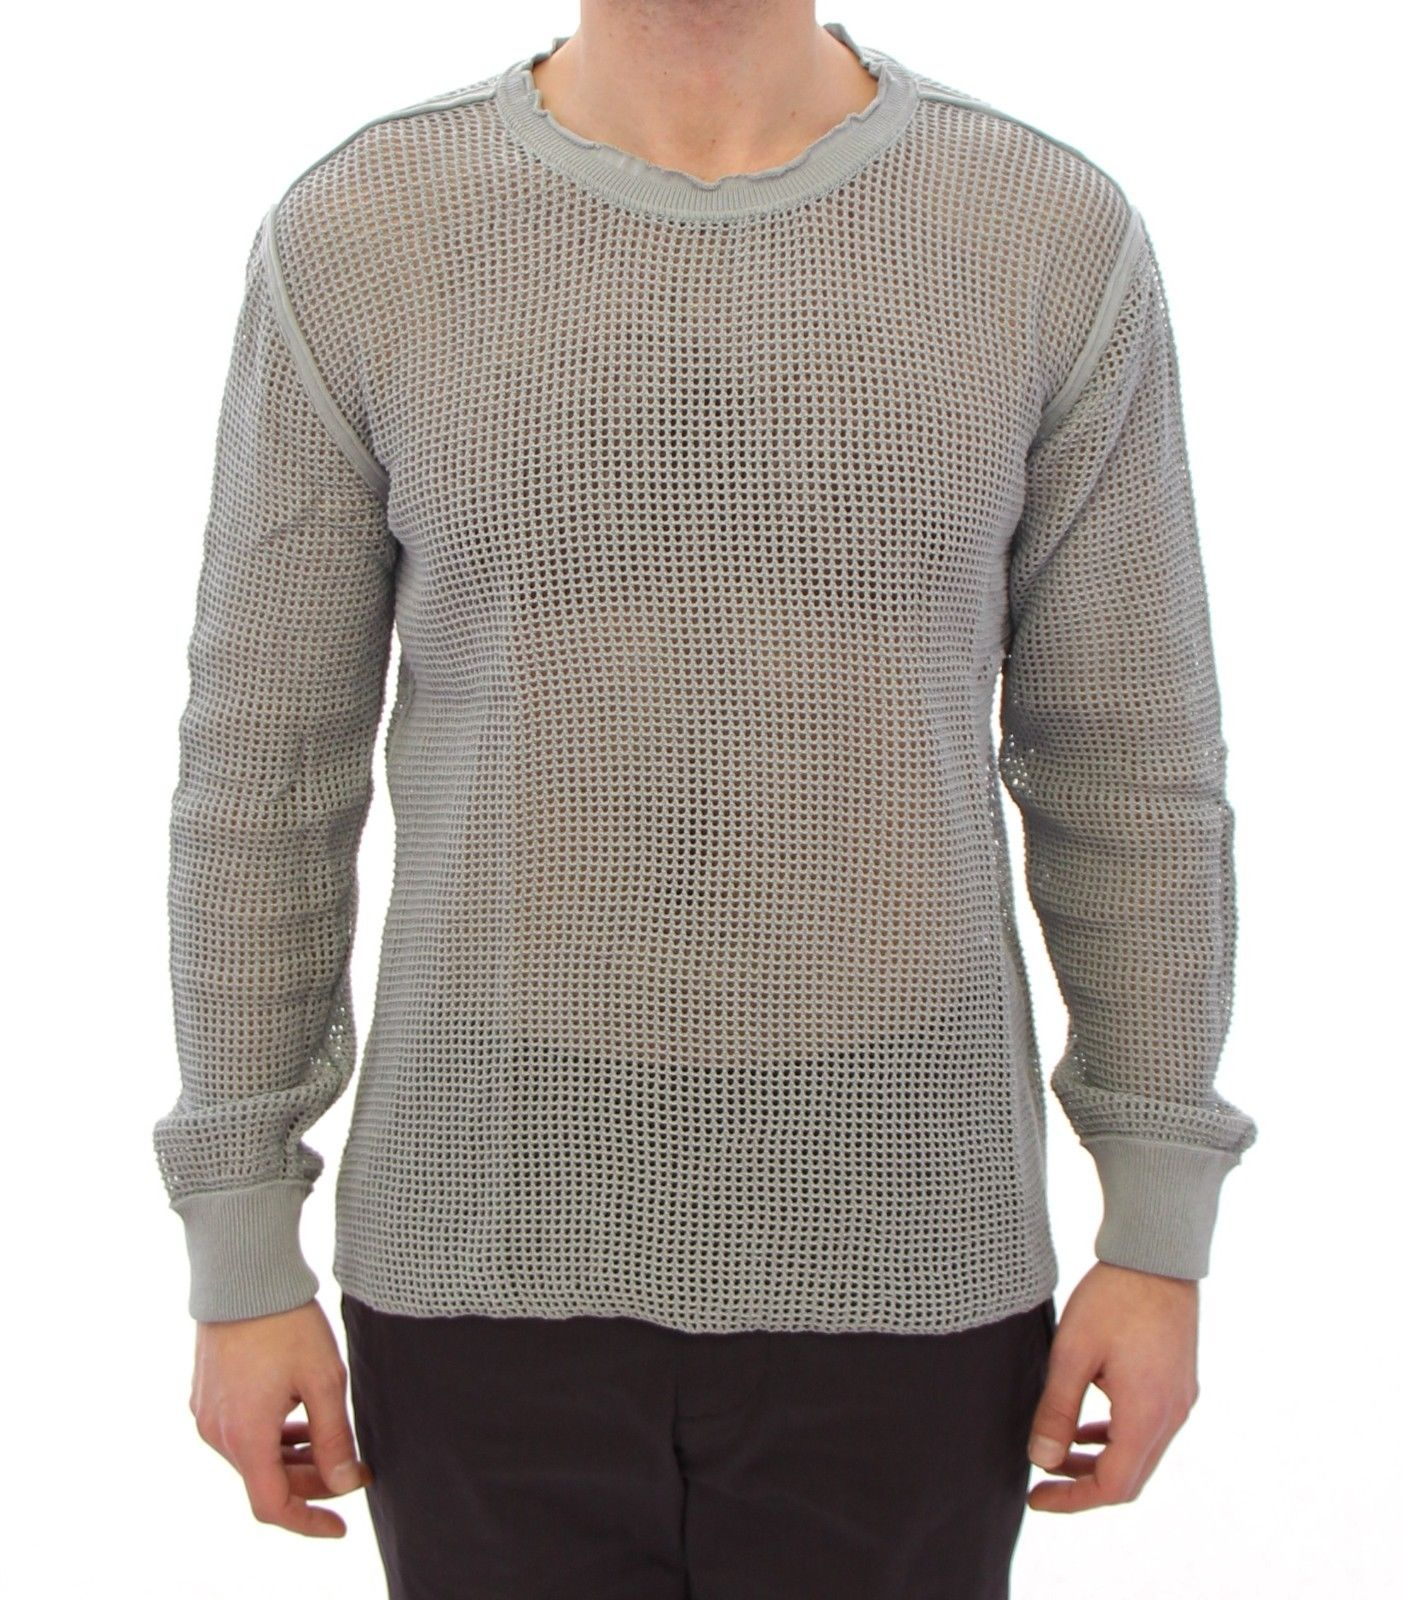 Dolce & Gabbana Men's Runway Logo Netz Pullover Netted Sweater Gray GTH10681 - IT56 | XXL